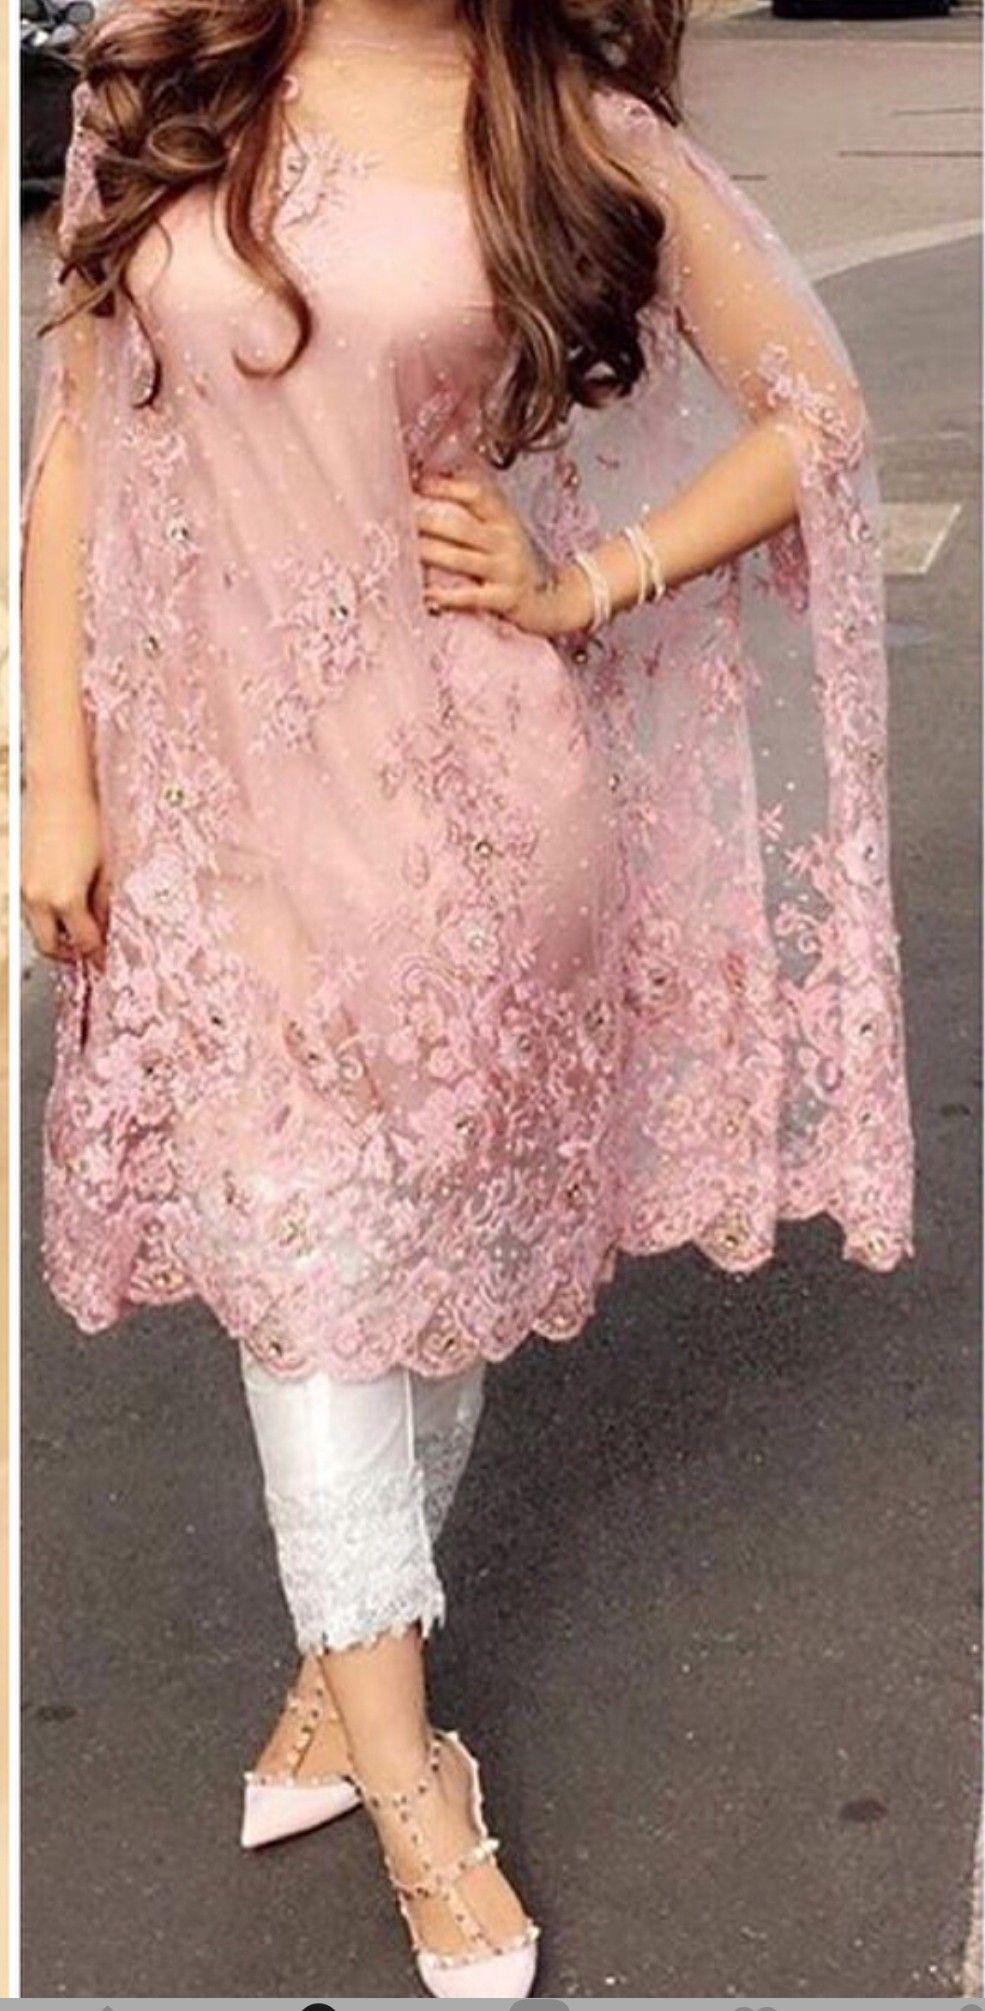 Pin de pakeeza shafeeq en Wedding wear | Pinterest | Blusas ...